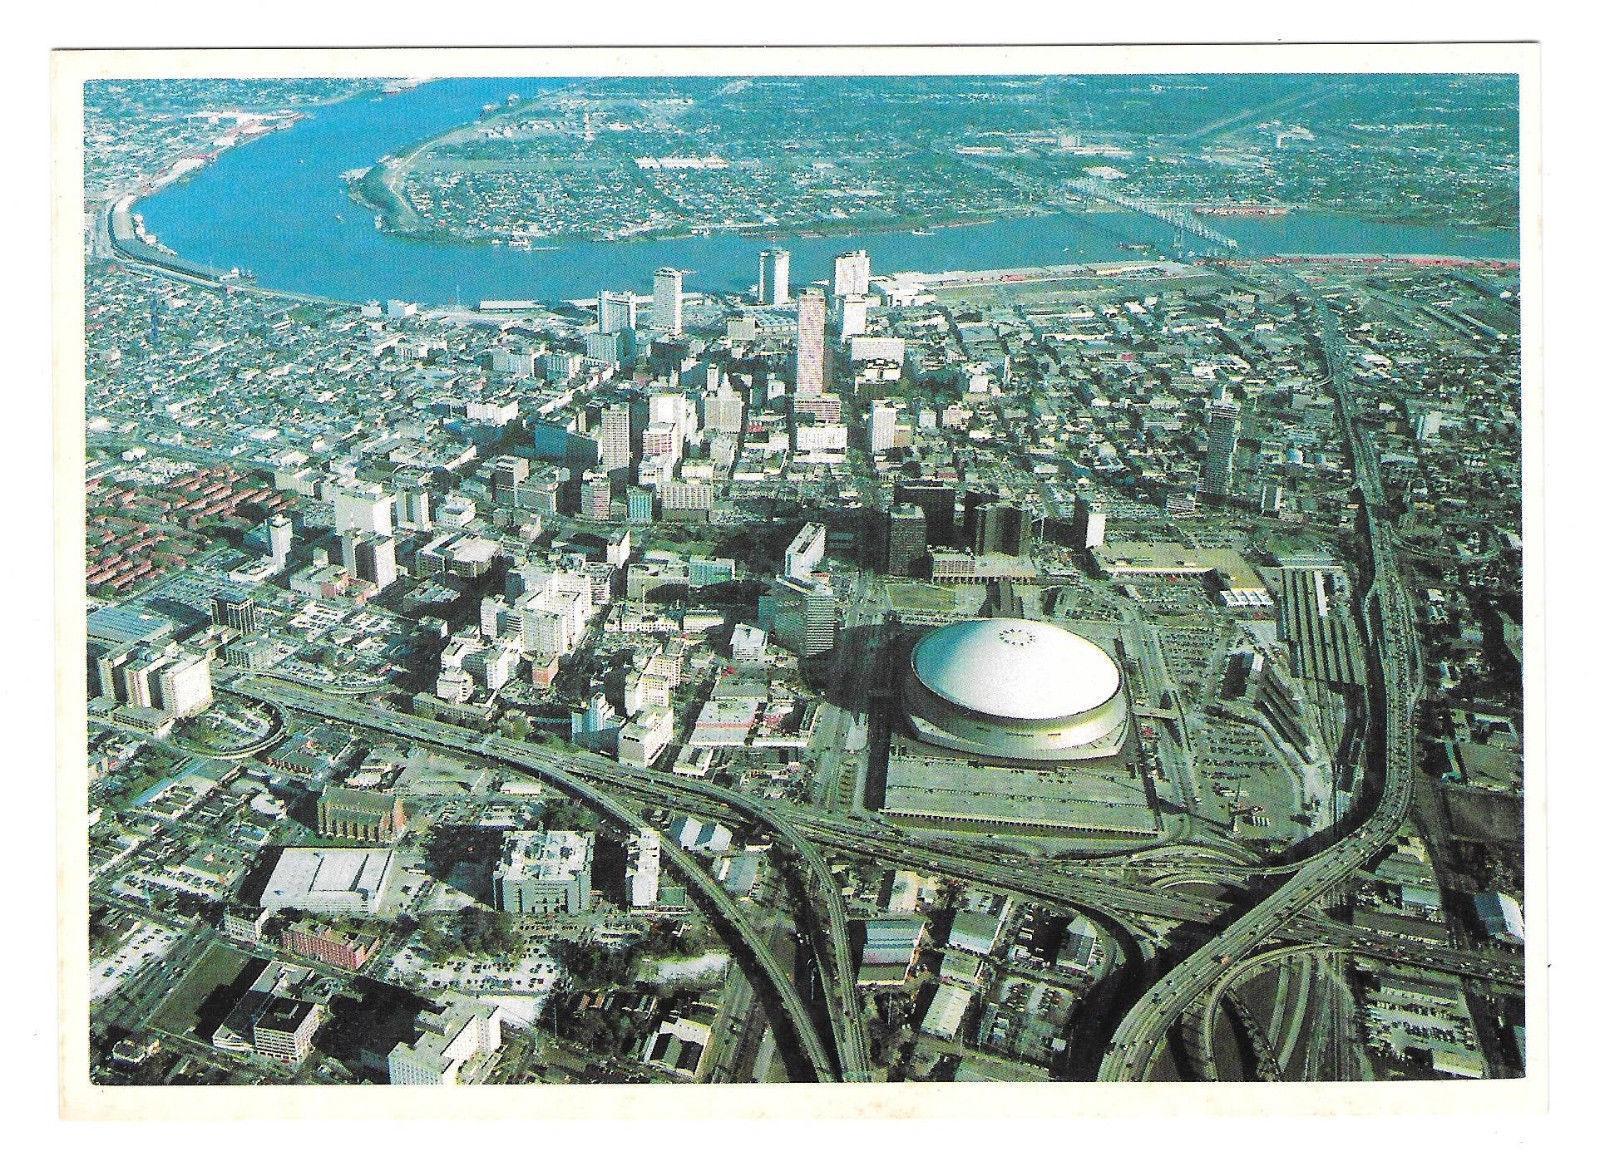 LA New Orleans Aerial View Superdome Mississippi Bridge Hotels Vtg Postcard 4X6